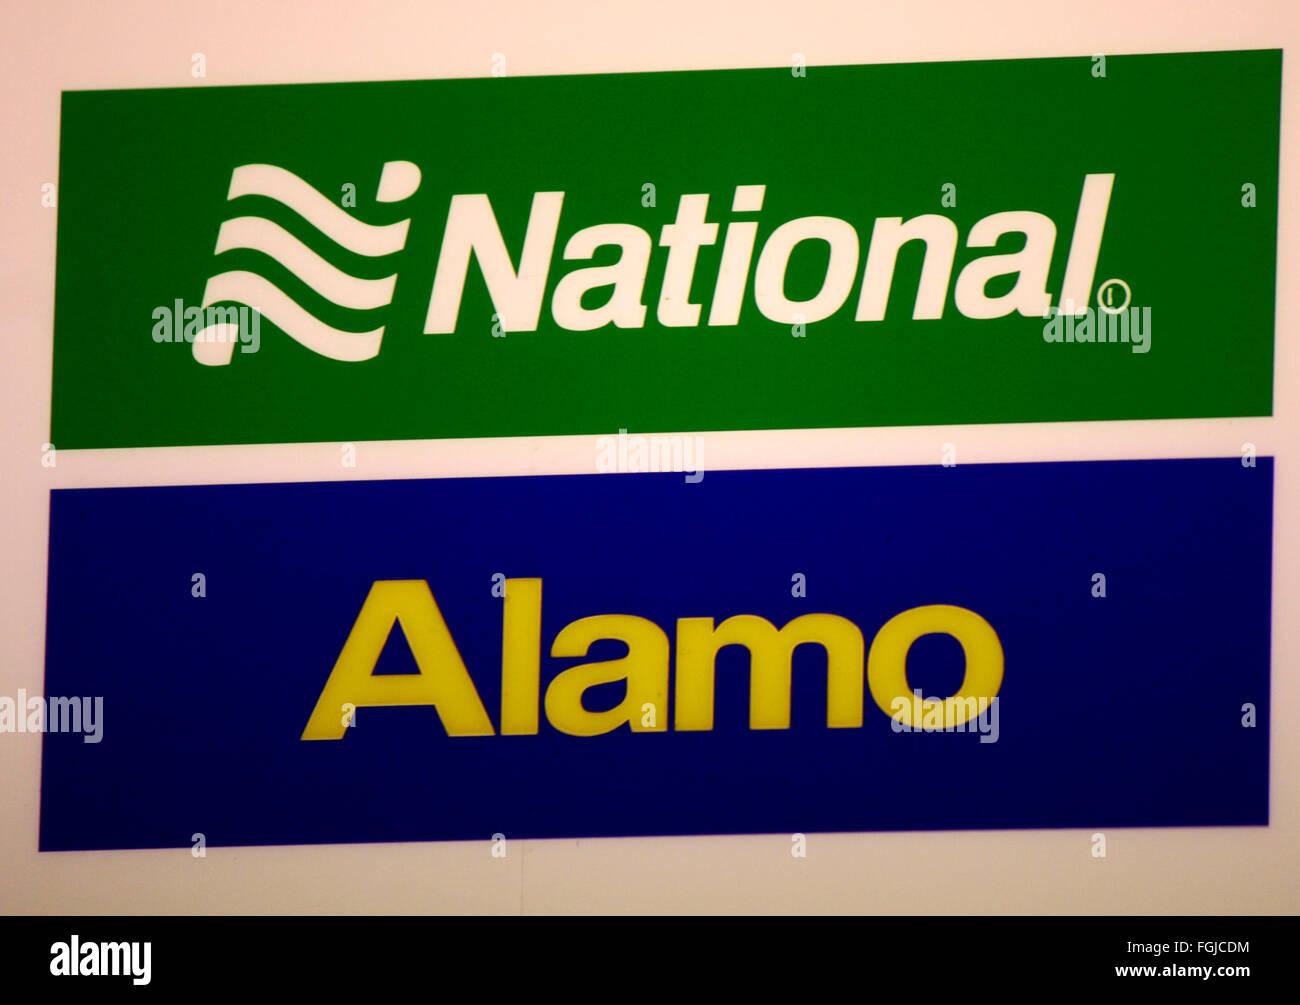 Markenname: 'National' und 'Alamo', Berlin. - Stock Image